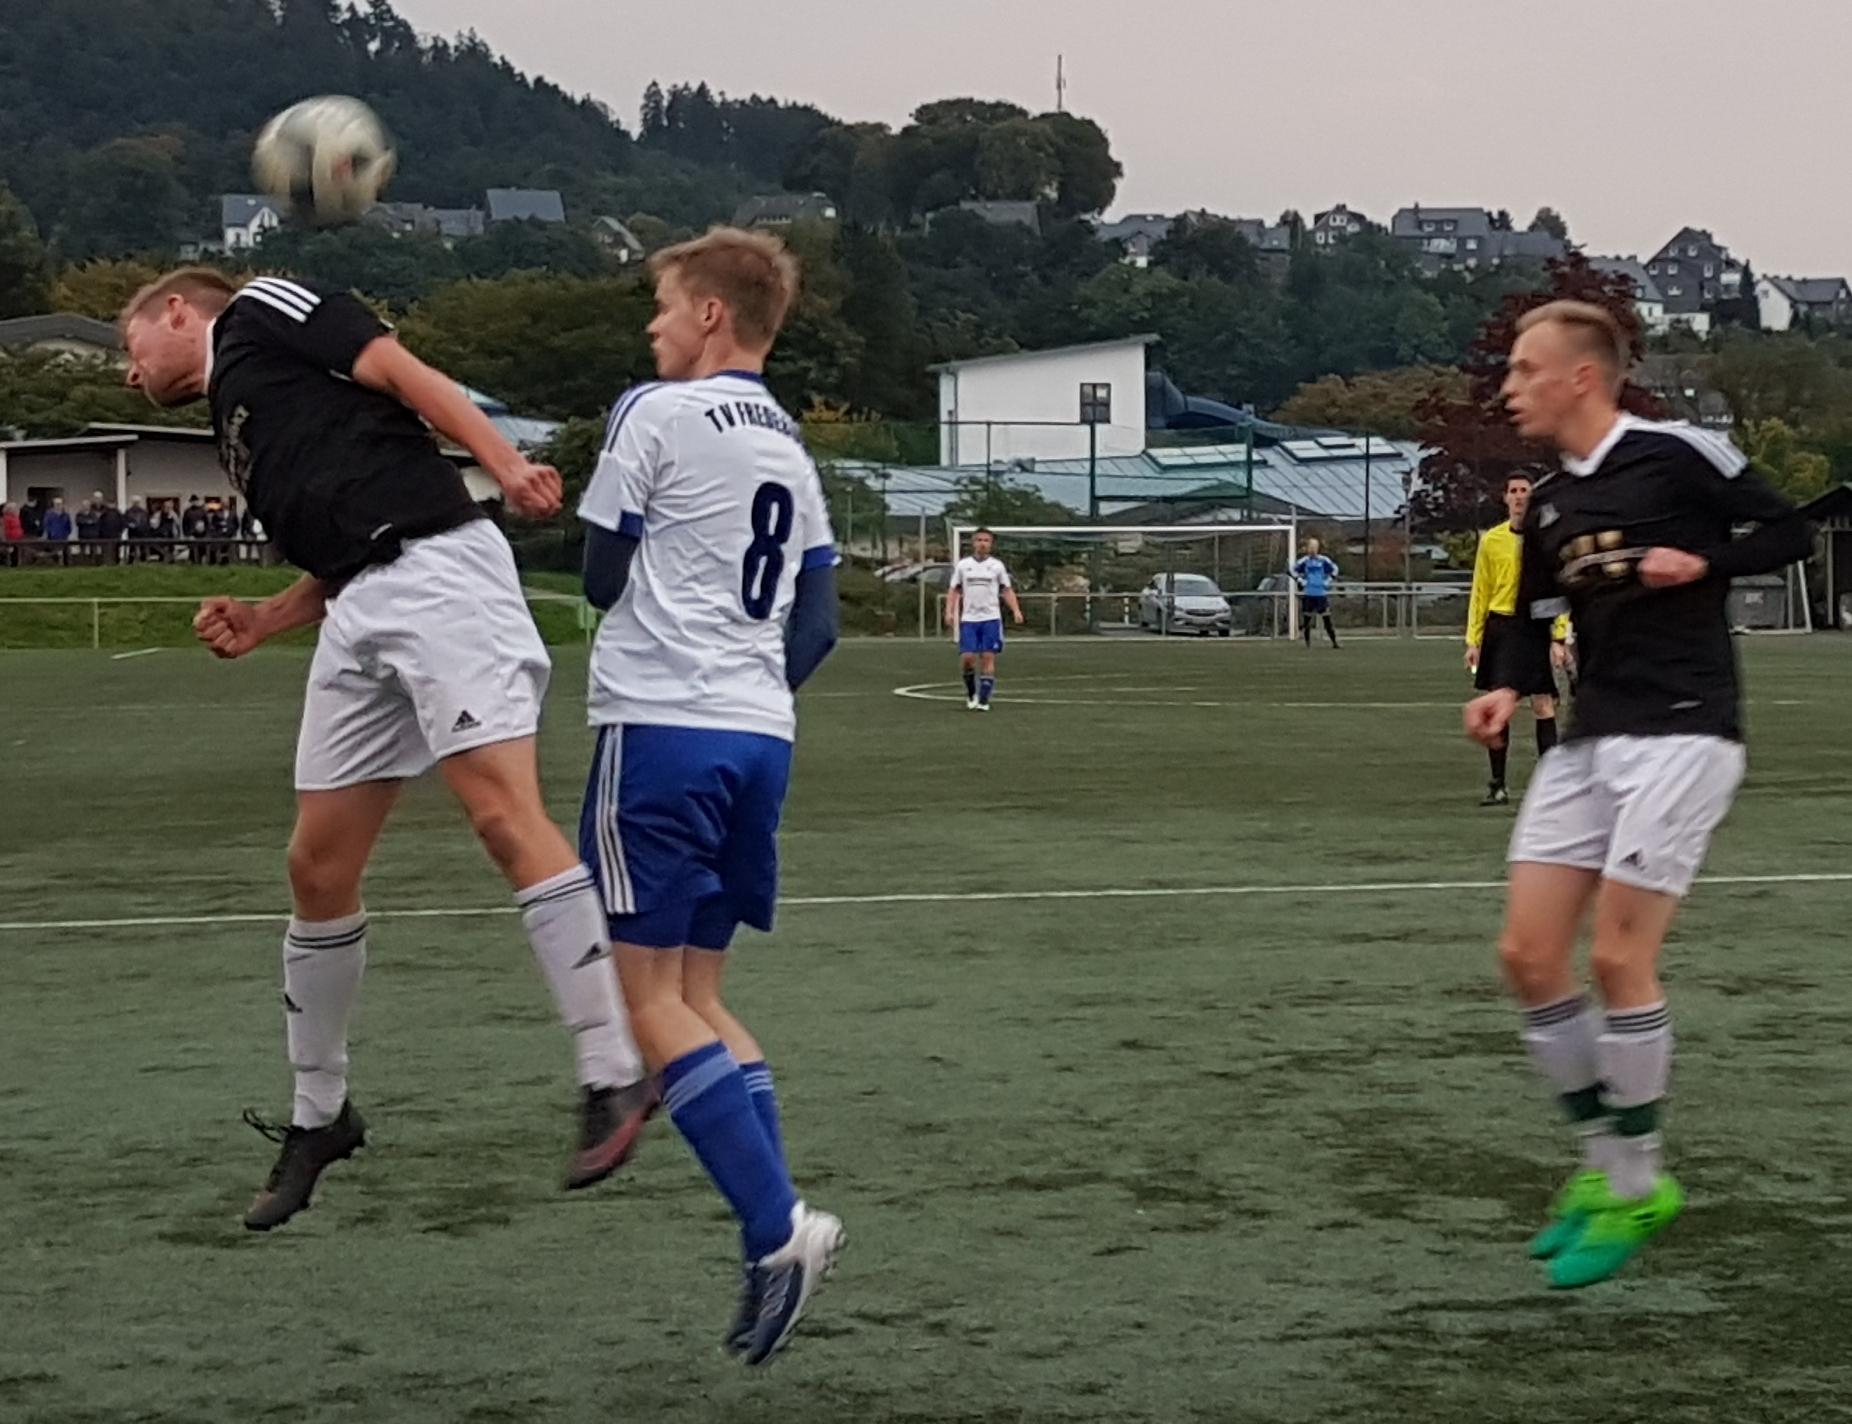 TV I mit Duselsieg gegen FC Ostwig/Nuttlar